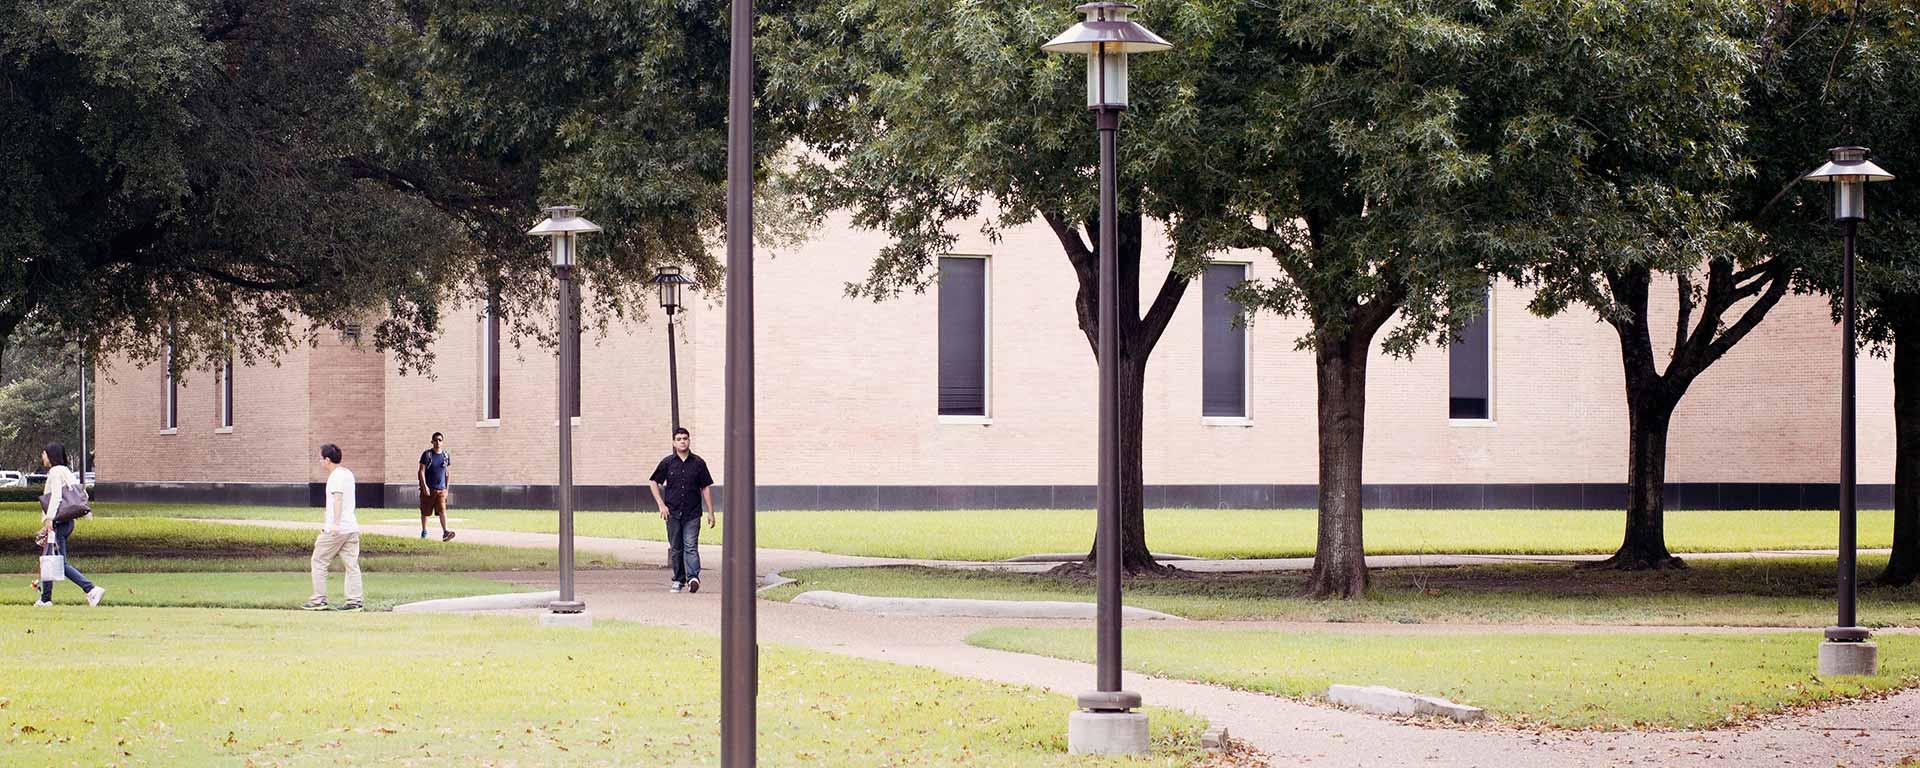 Employee Verification - University of Houston